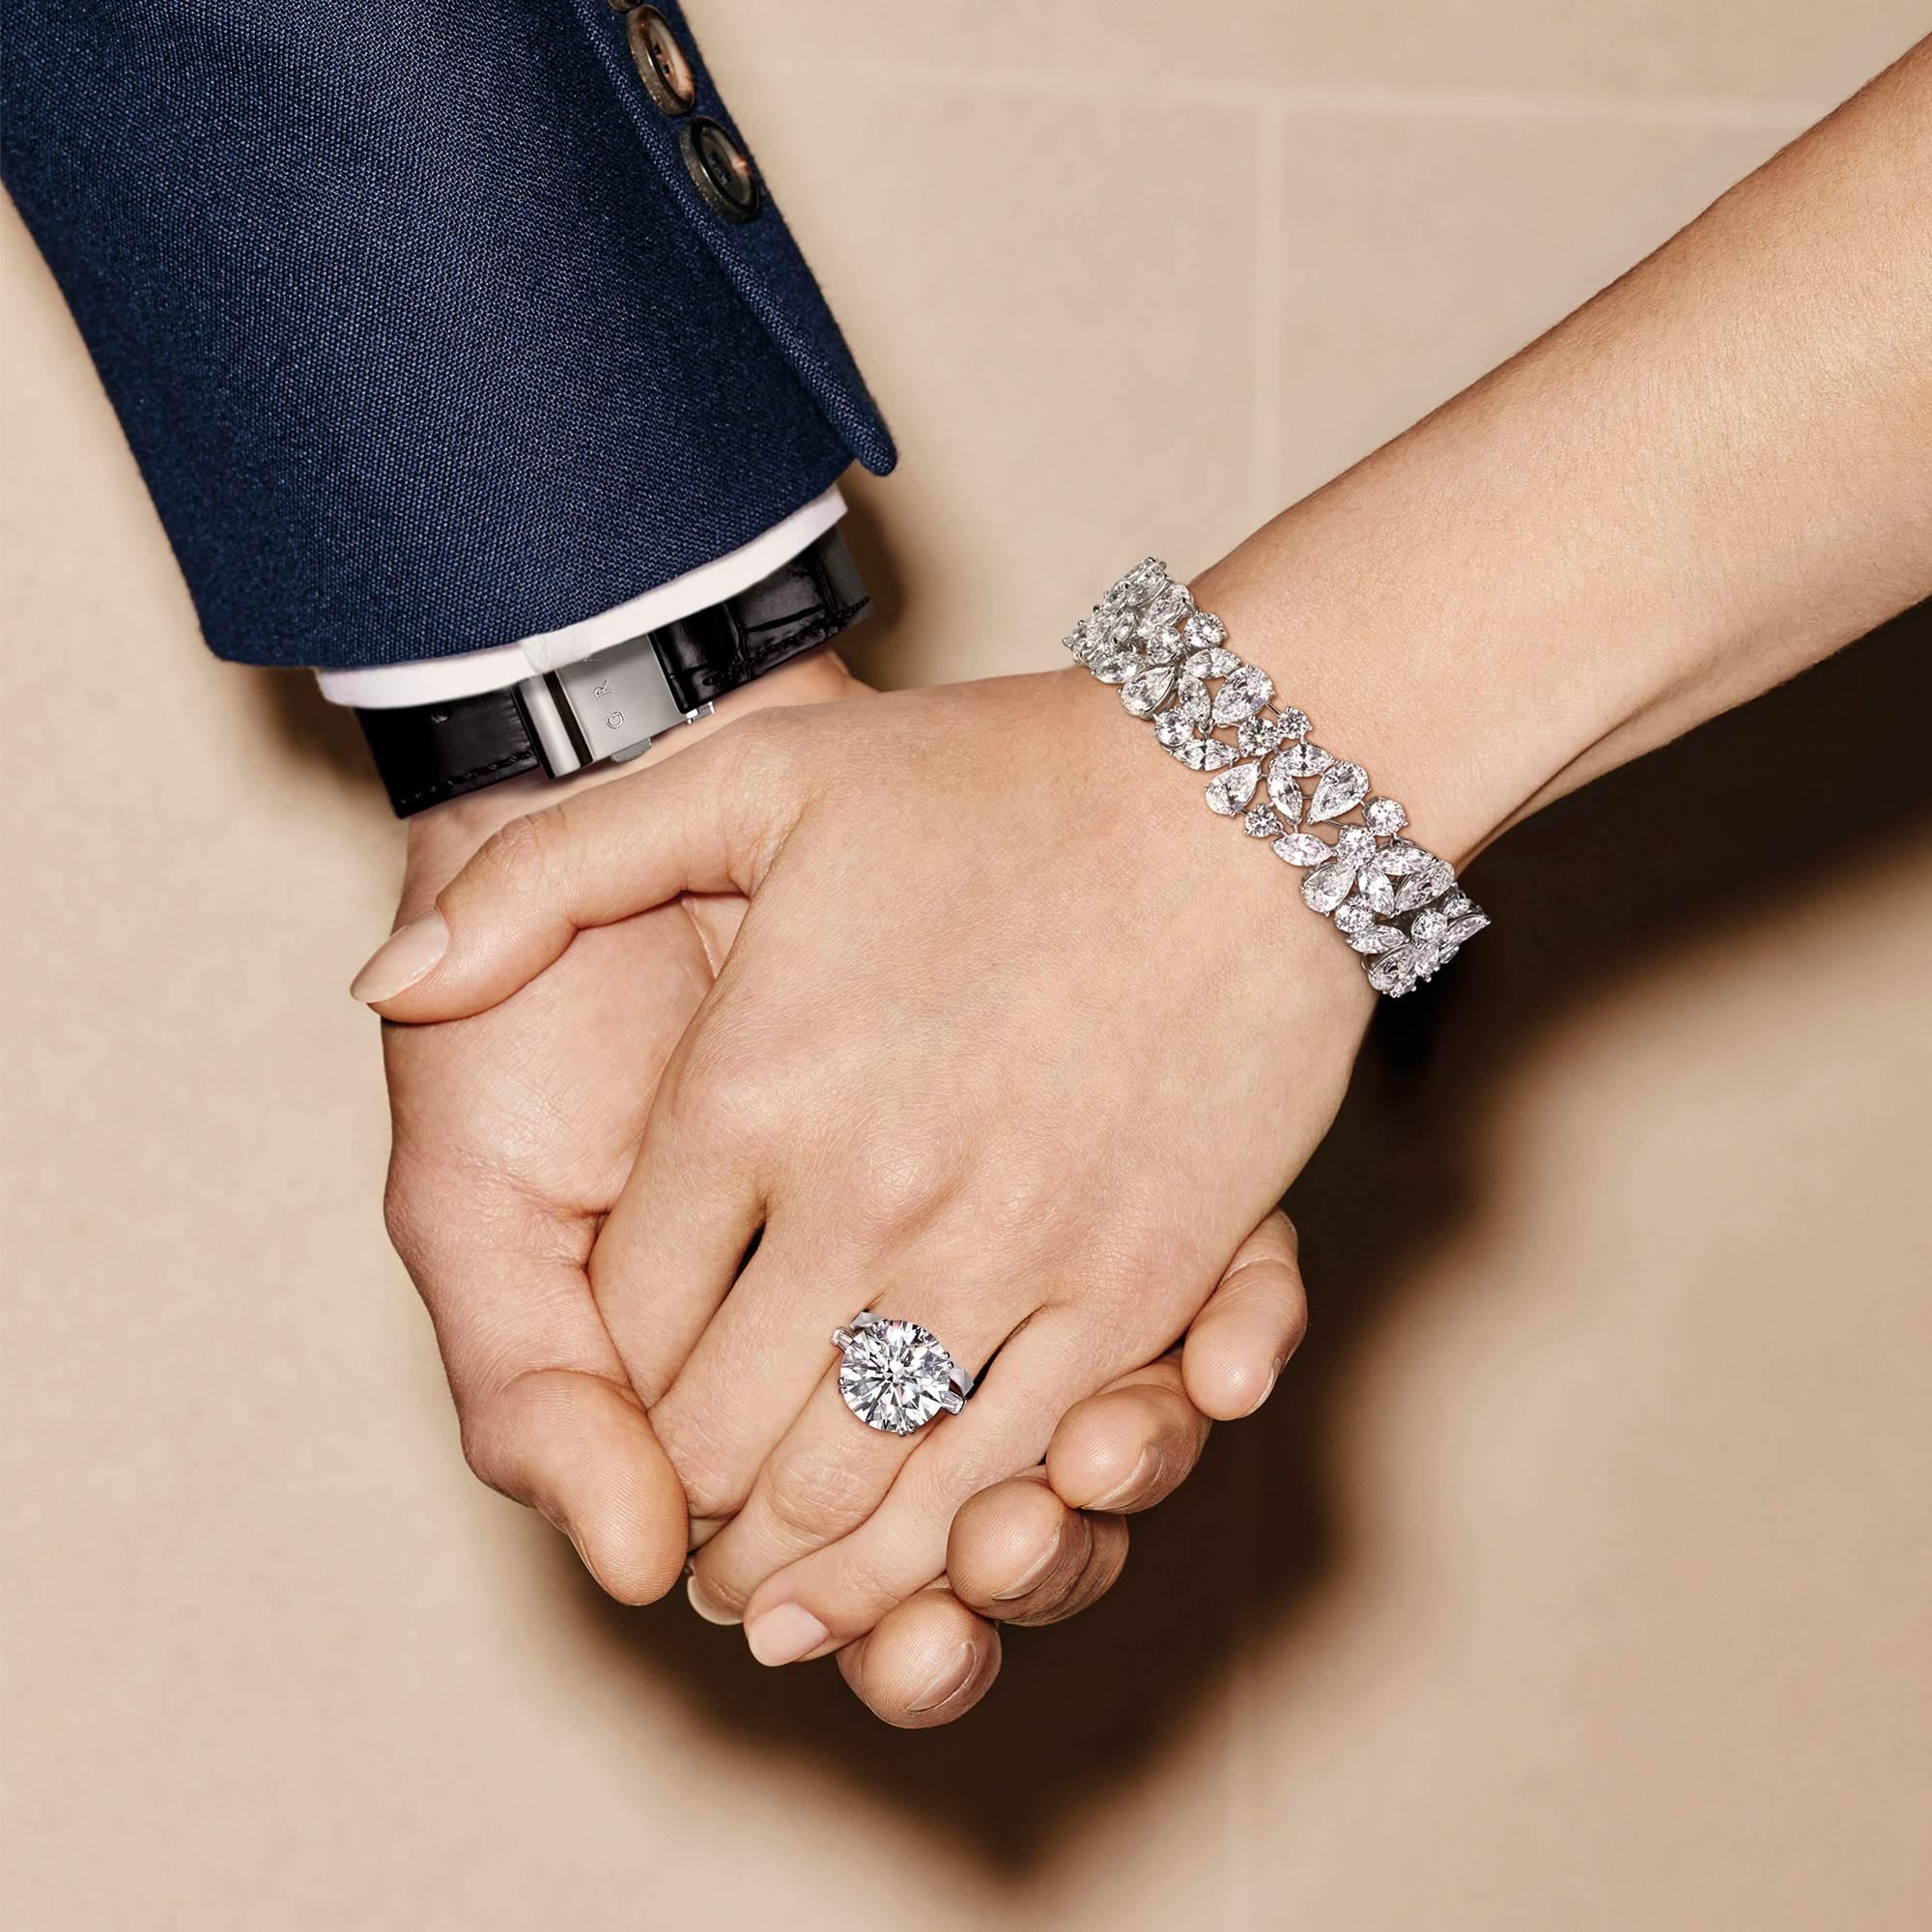 Graff engagement rings